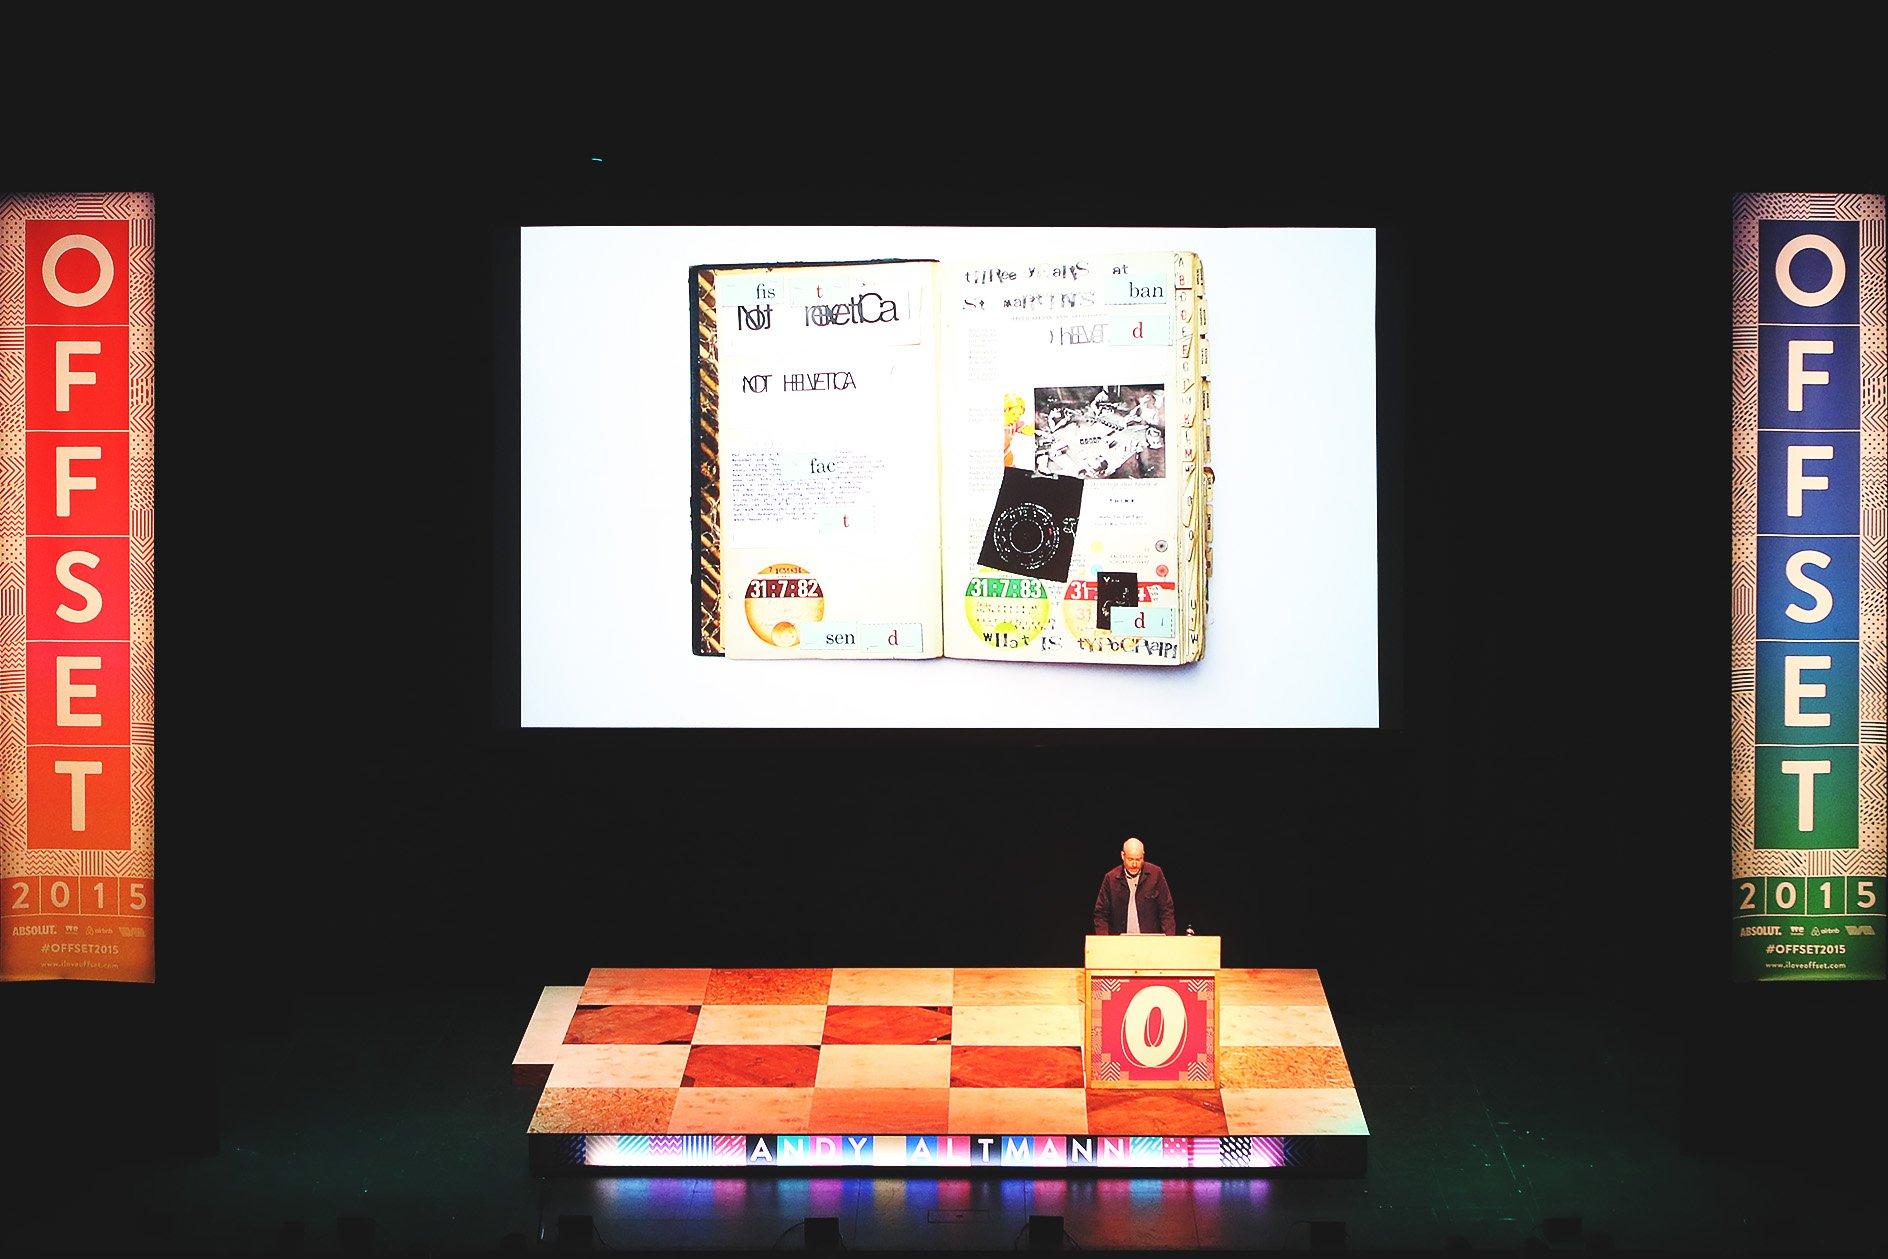 Andy Altmann at OFFSET 2015 – Work samples